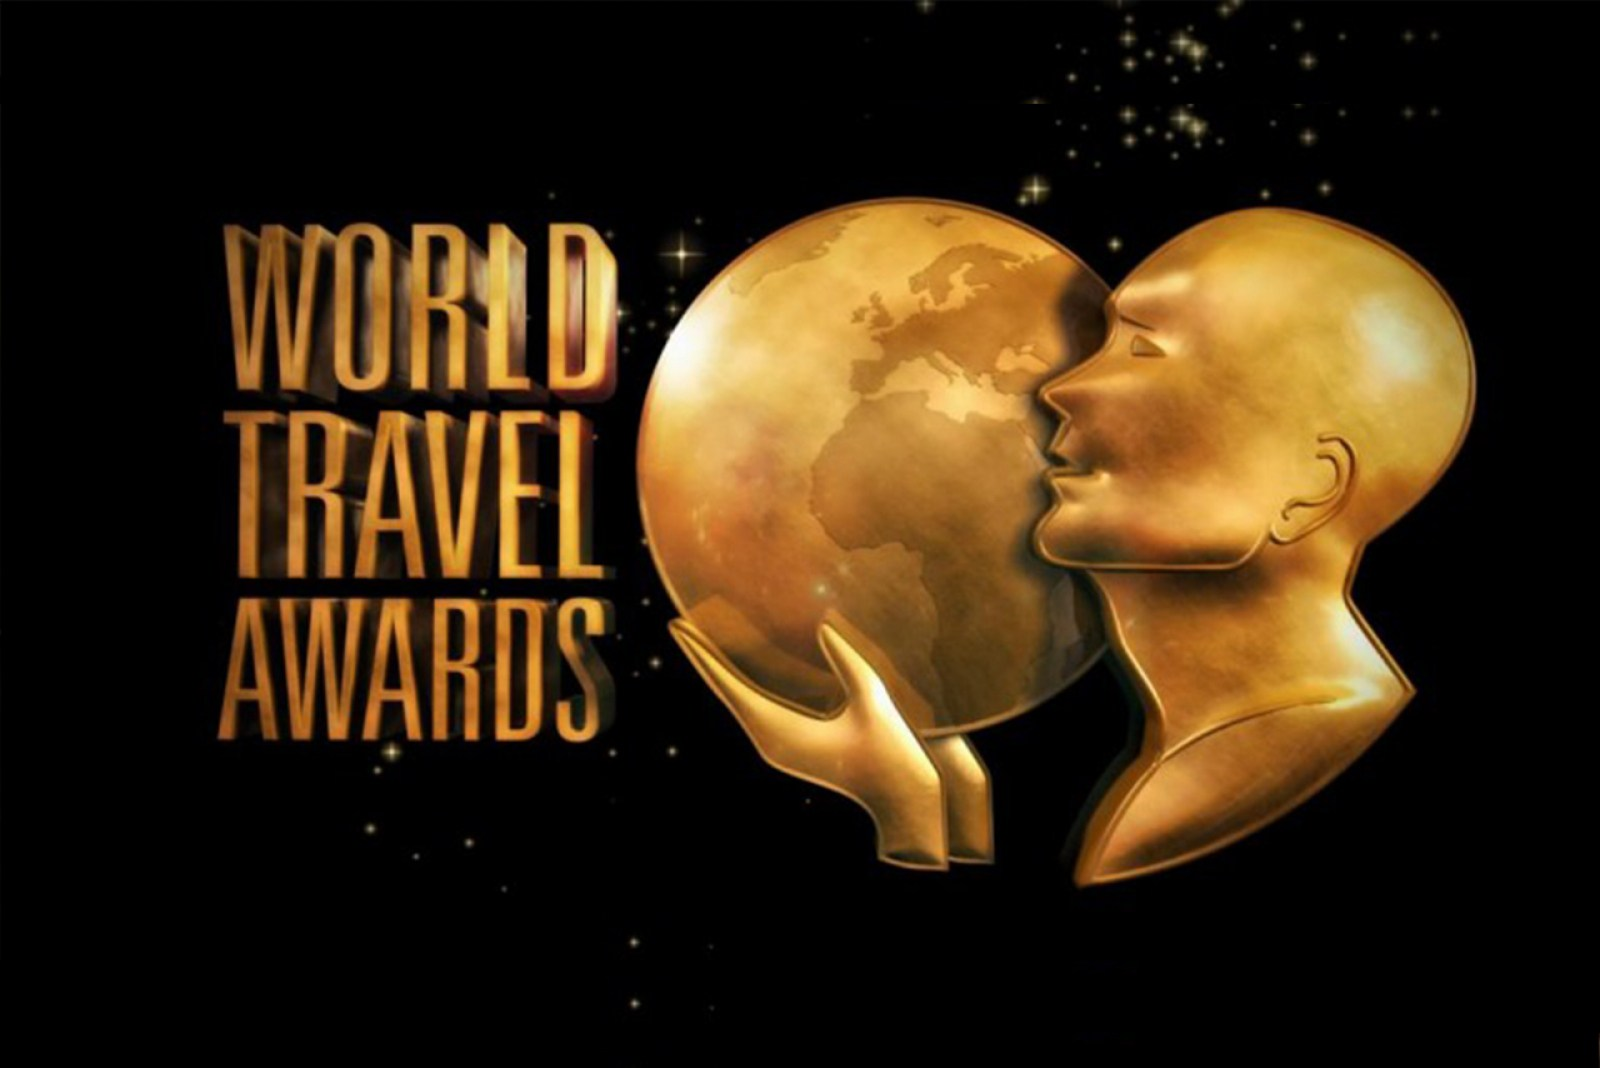 Ecuador premios World Travel Awards 2018